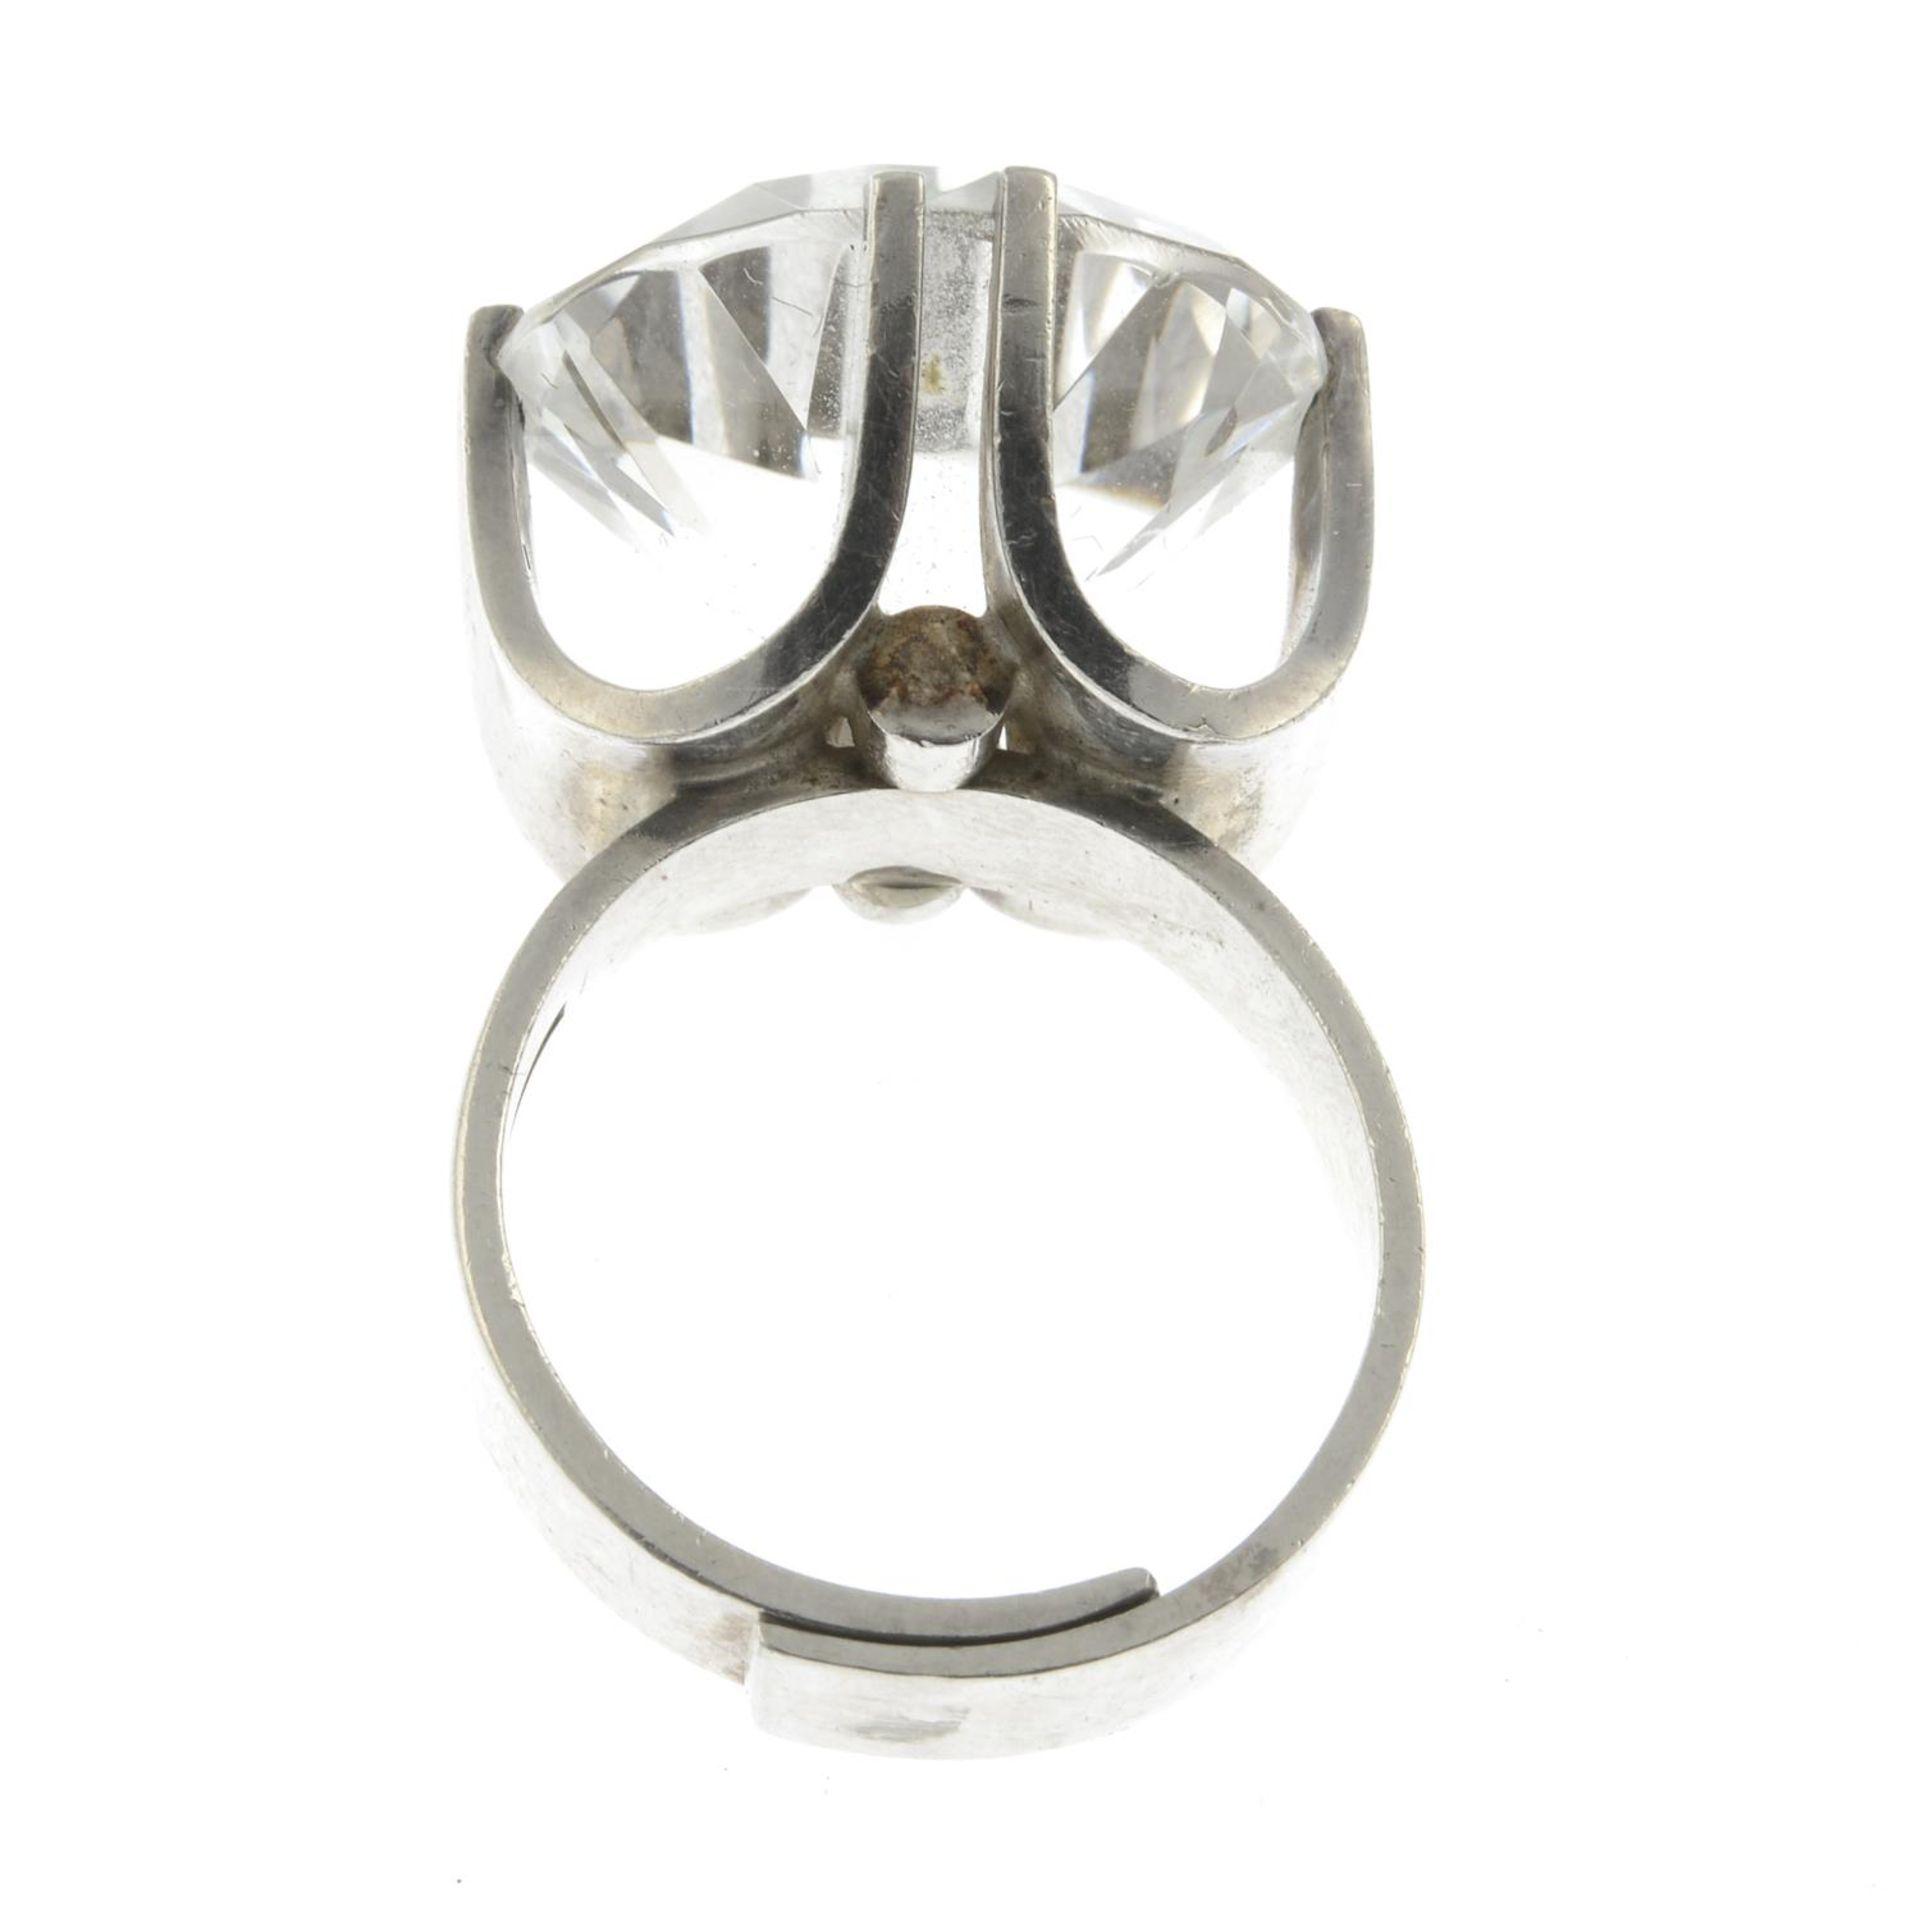 A Modernist quartz ring, by Elis Kauppi for Kupittan Kulta.With maker's marks for Kupittan Kulta. - Image 2 of 2